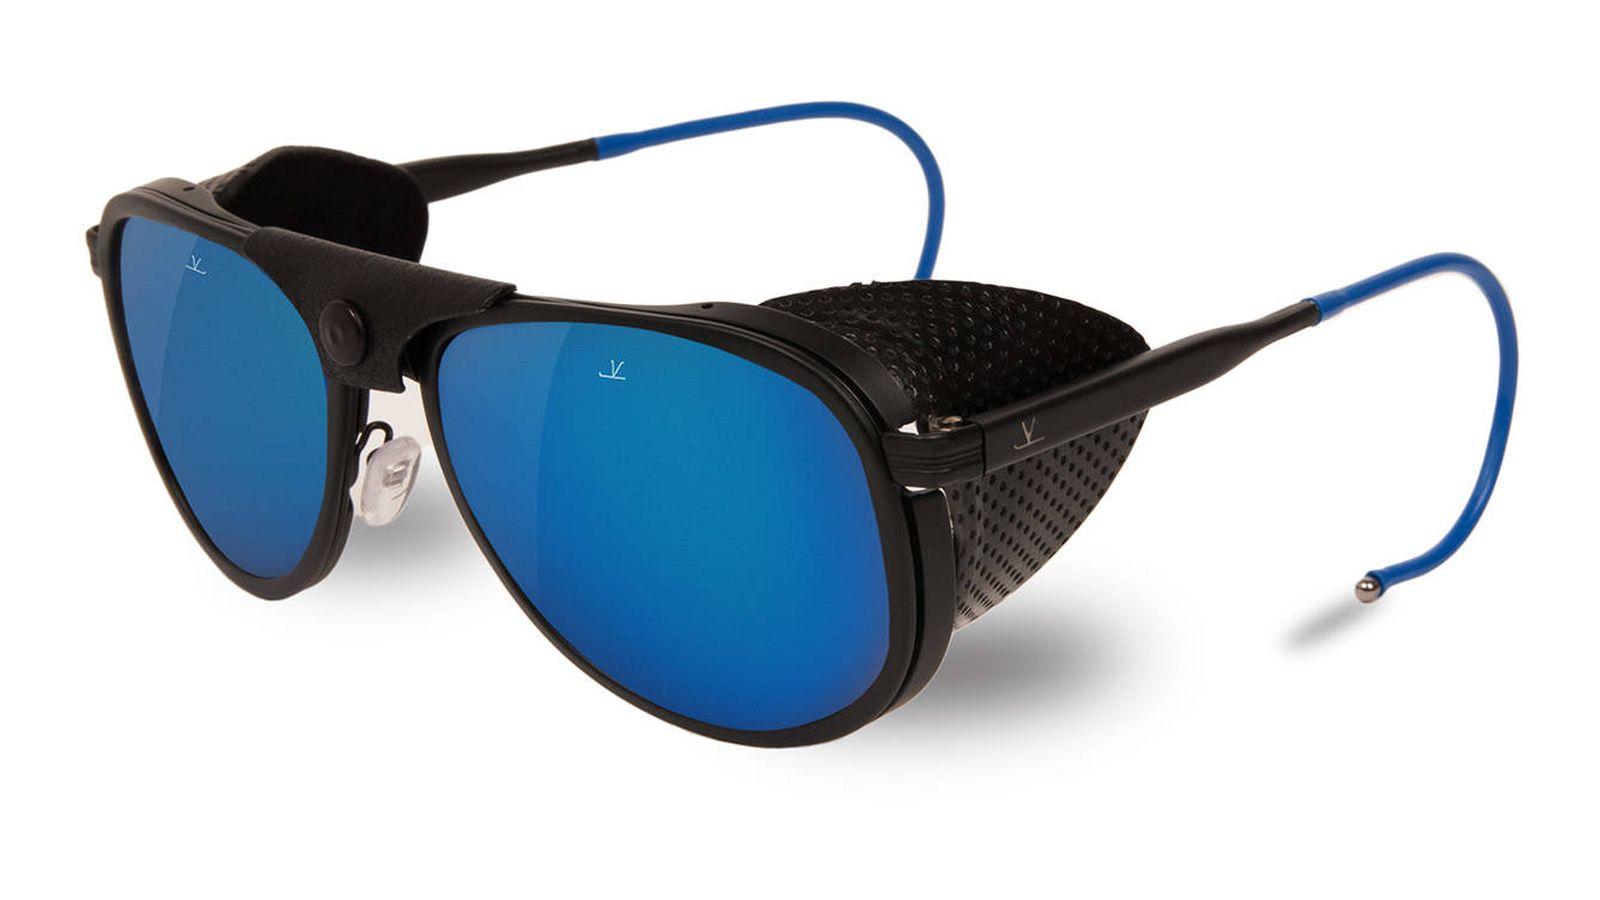 b277e78e8a Moda hombre: Vuarnet, las gafas de sol de los famosos